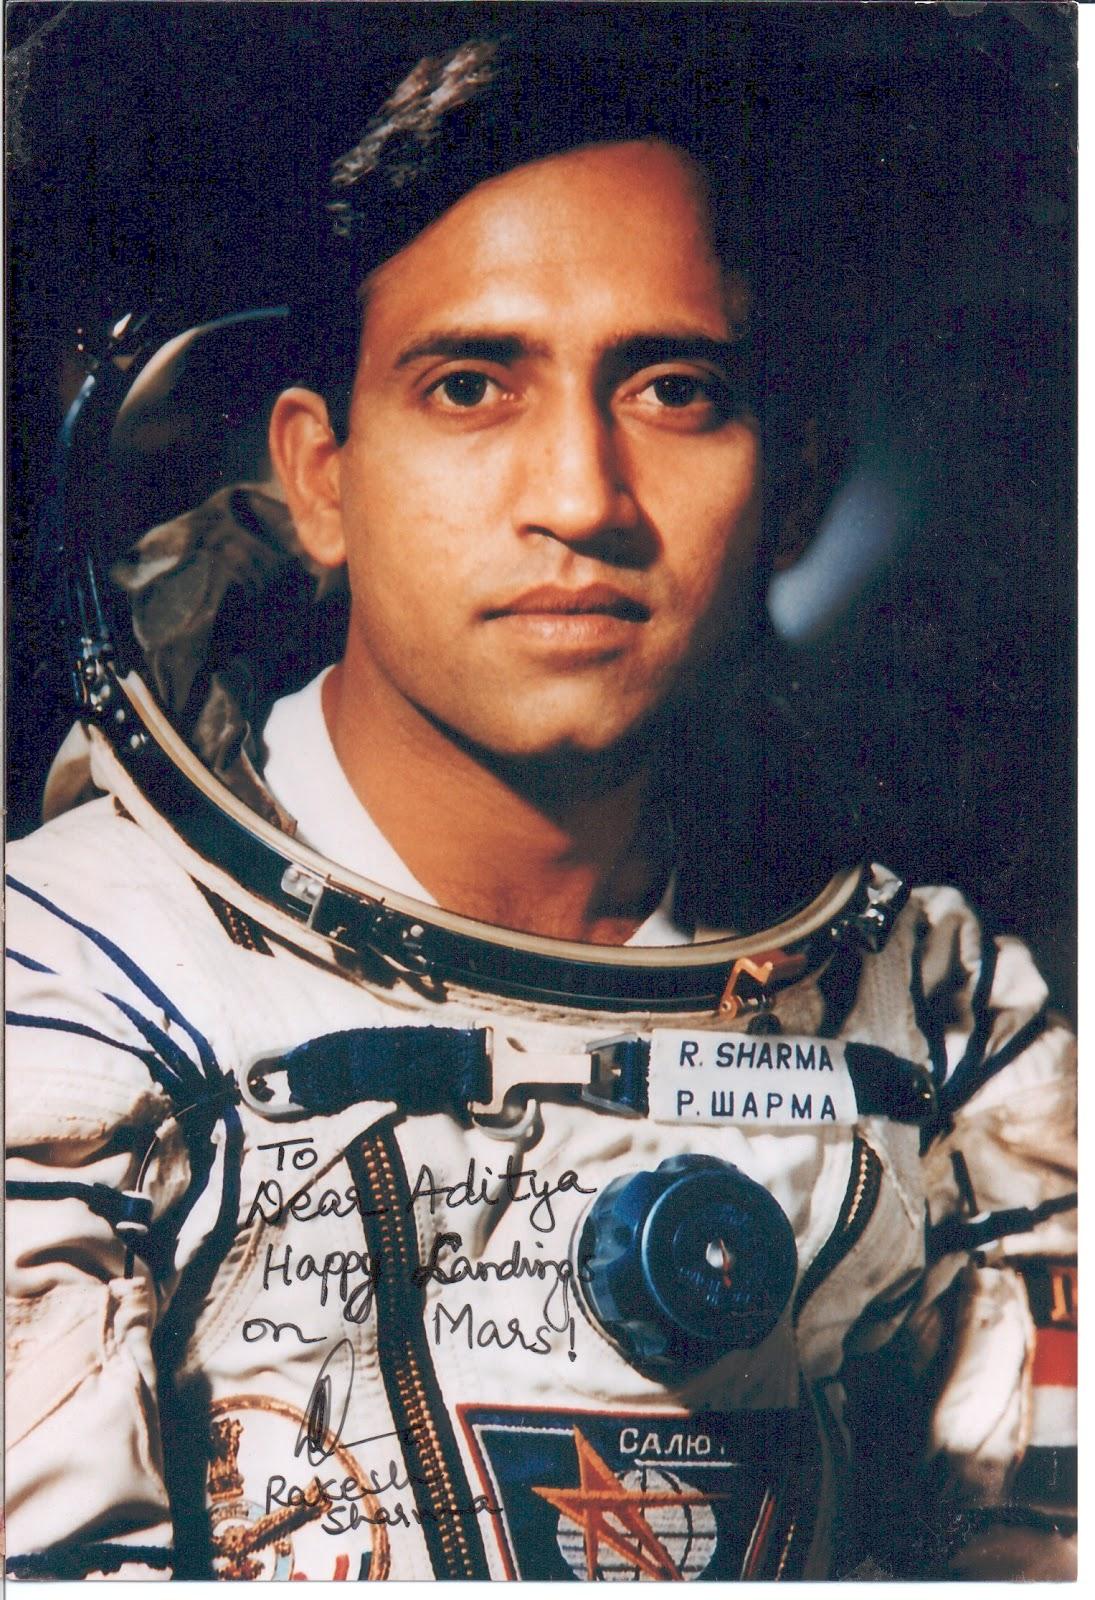 rakesh sharma moon landing images - photo #5